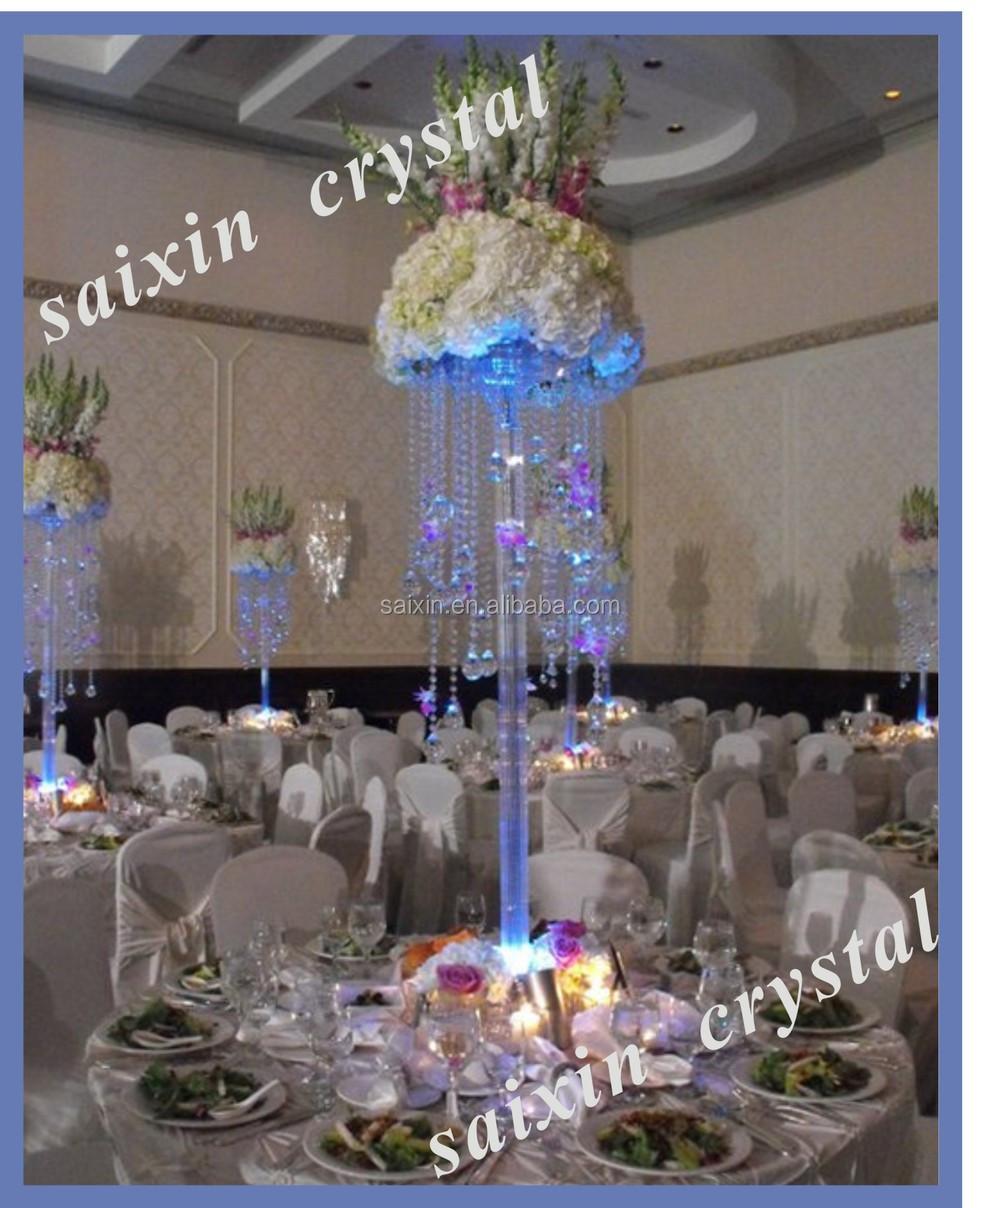 New design flower stand for wedding decoration china manufactur zt 110g see more wedding decoration junglespirit Choice Image